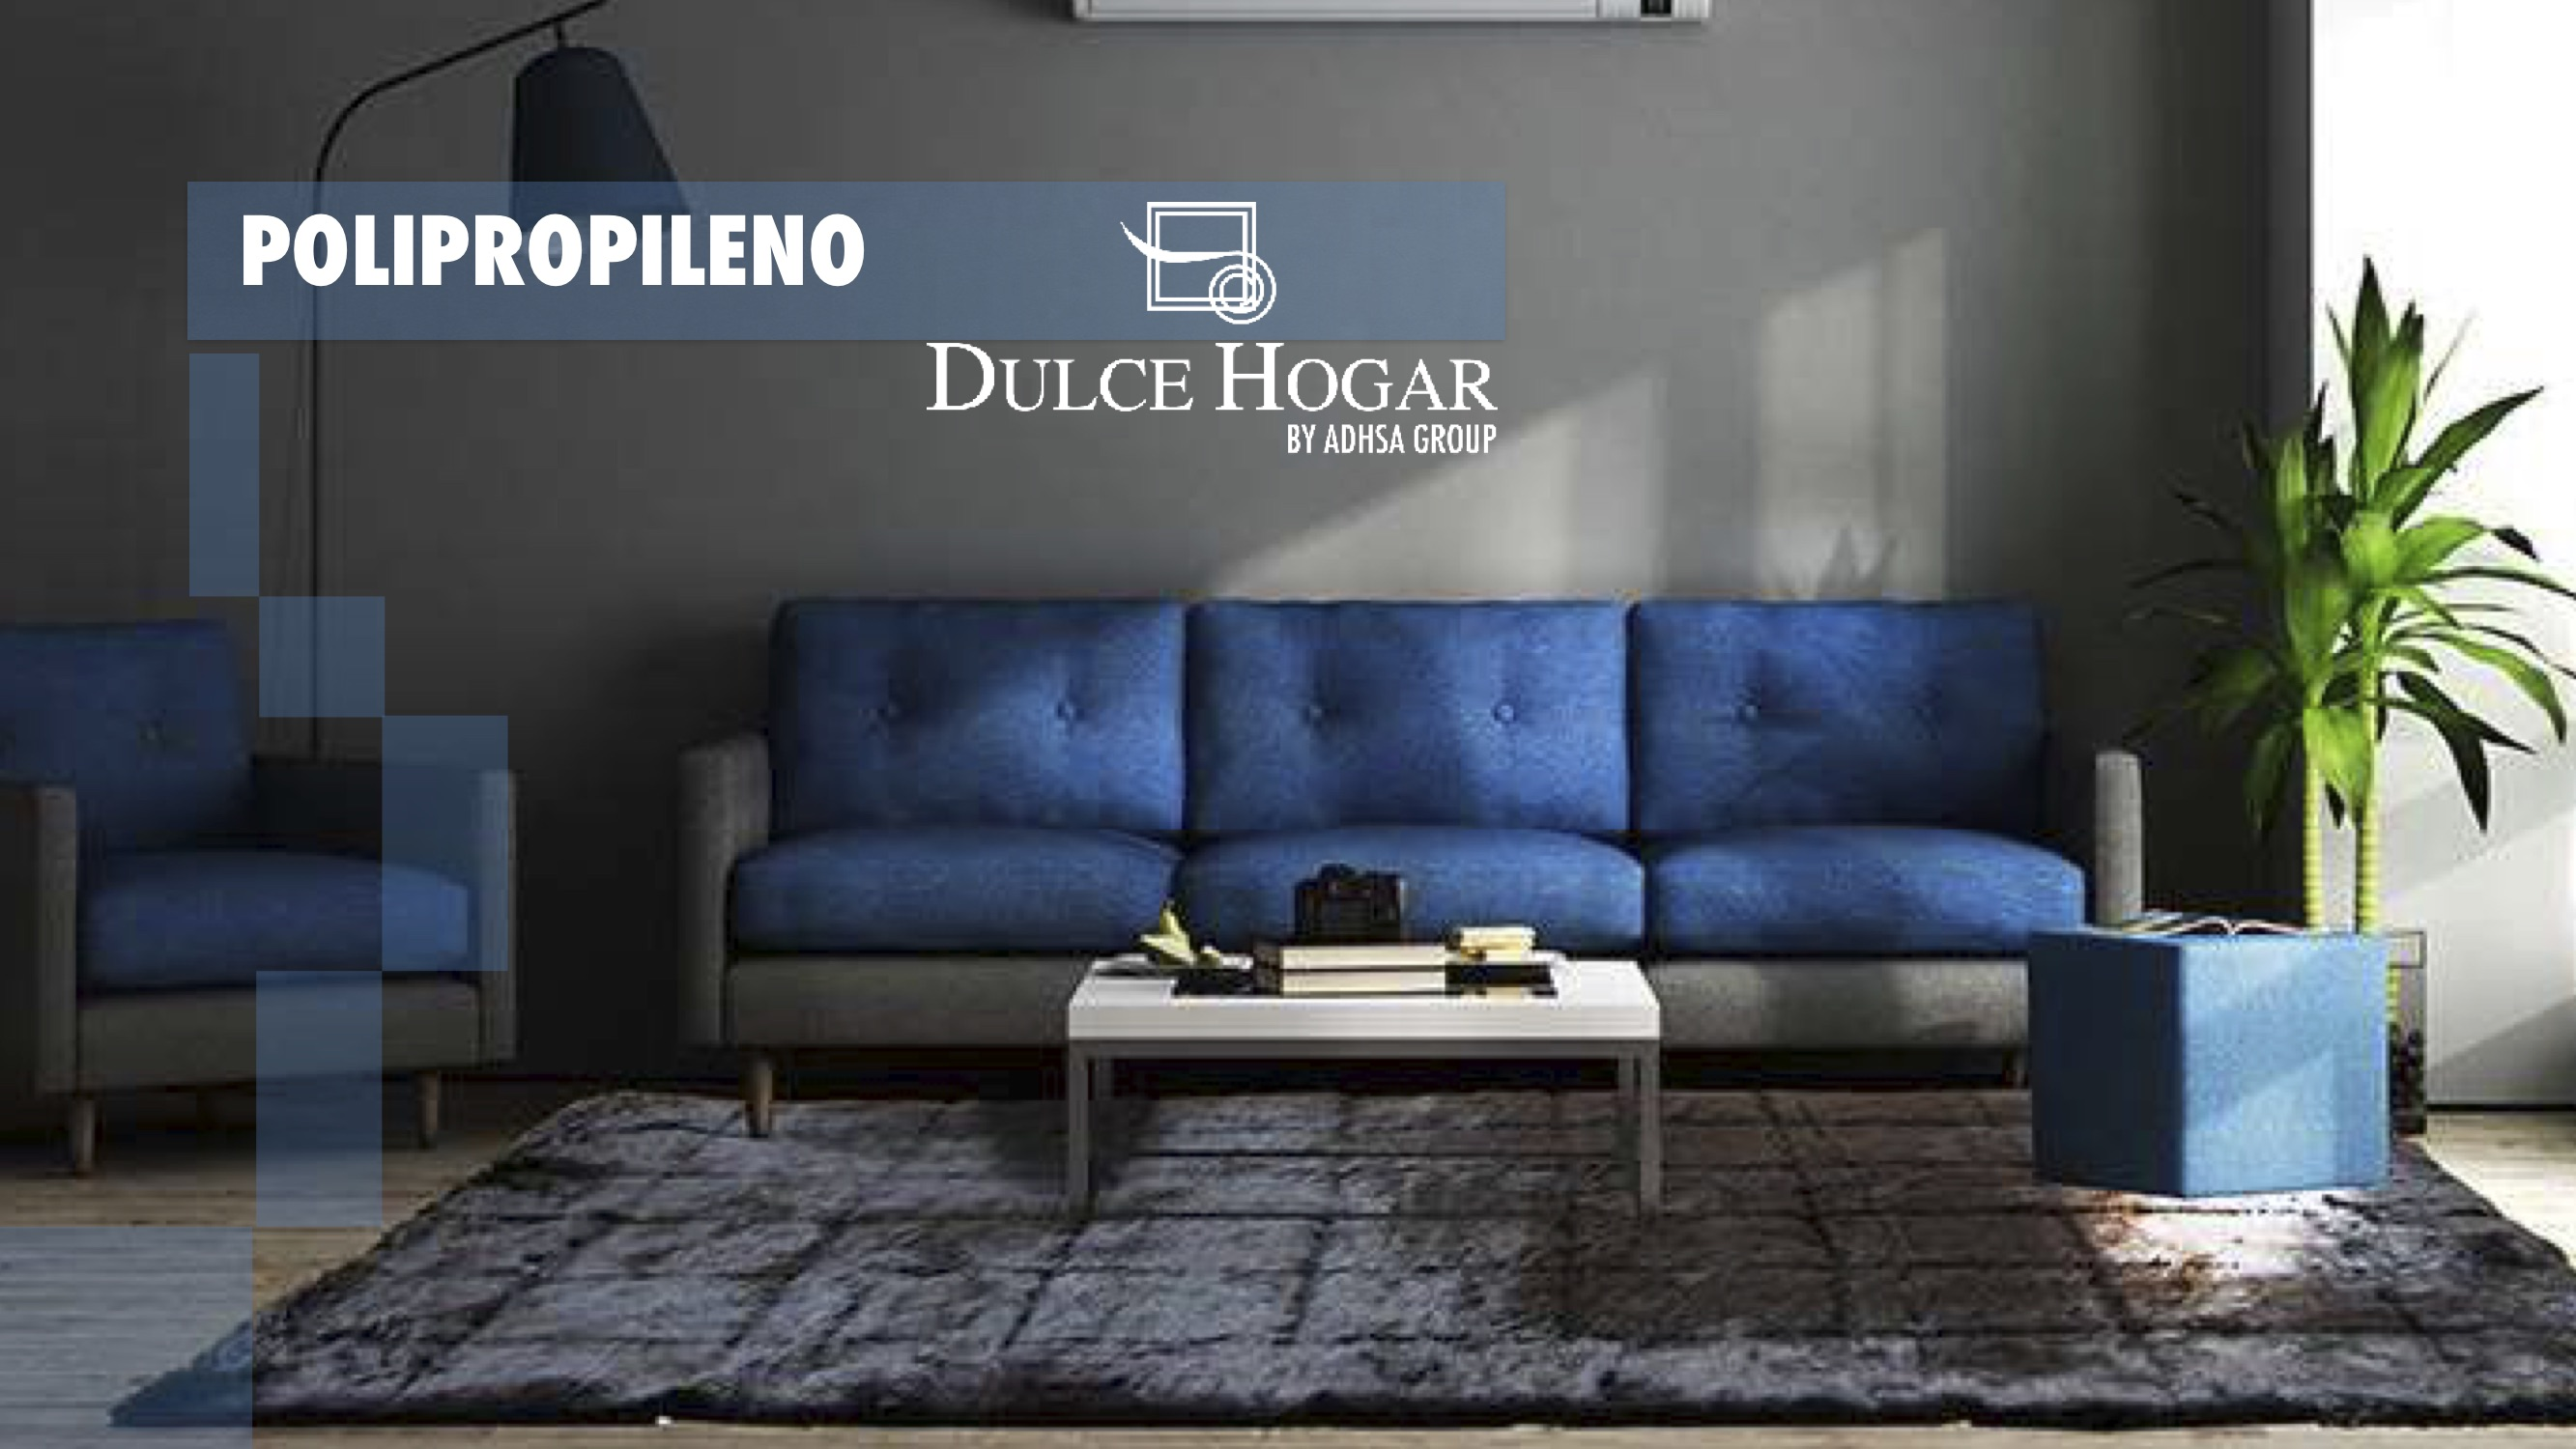 00-POLIPROPILENO_portada